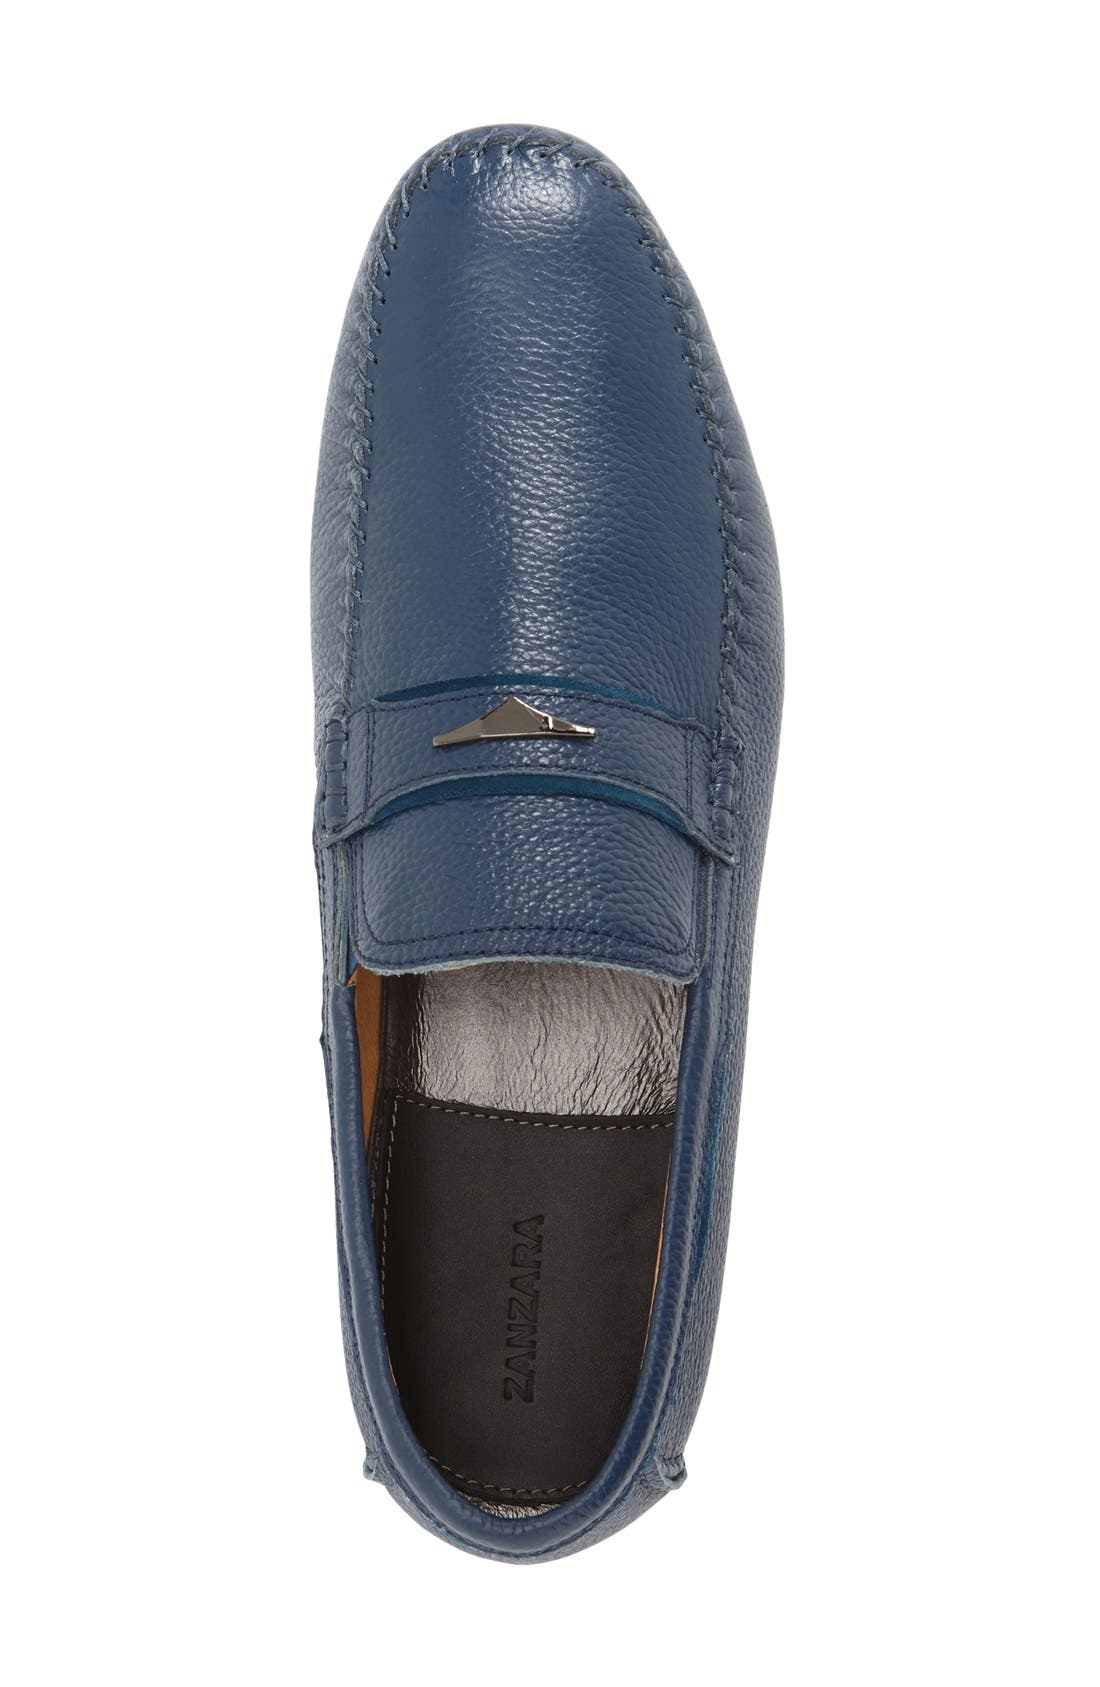 Alternate Image 2  - Zanzara Leather Loafer (Men)